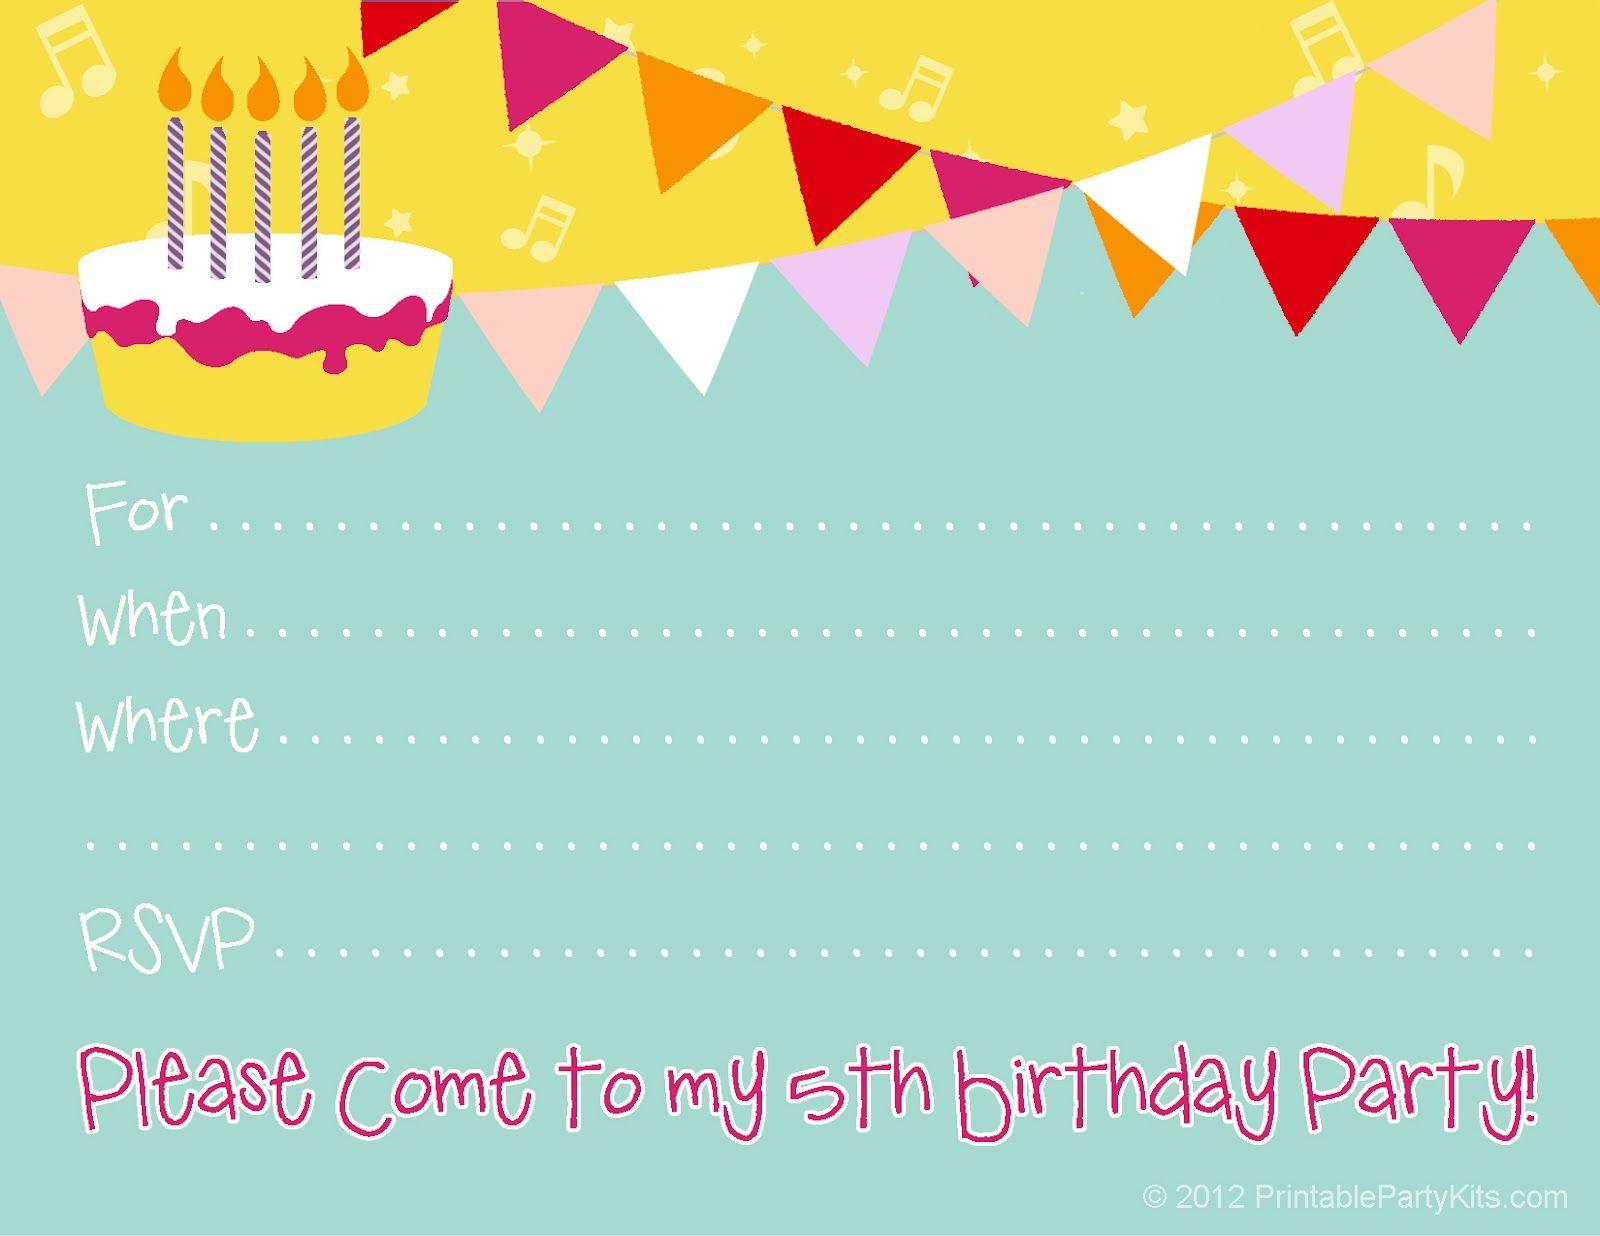 Pincarla Chadwick On Party Printables | Pinterest | Birthday - Happy Birthday Invitations Free Printable